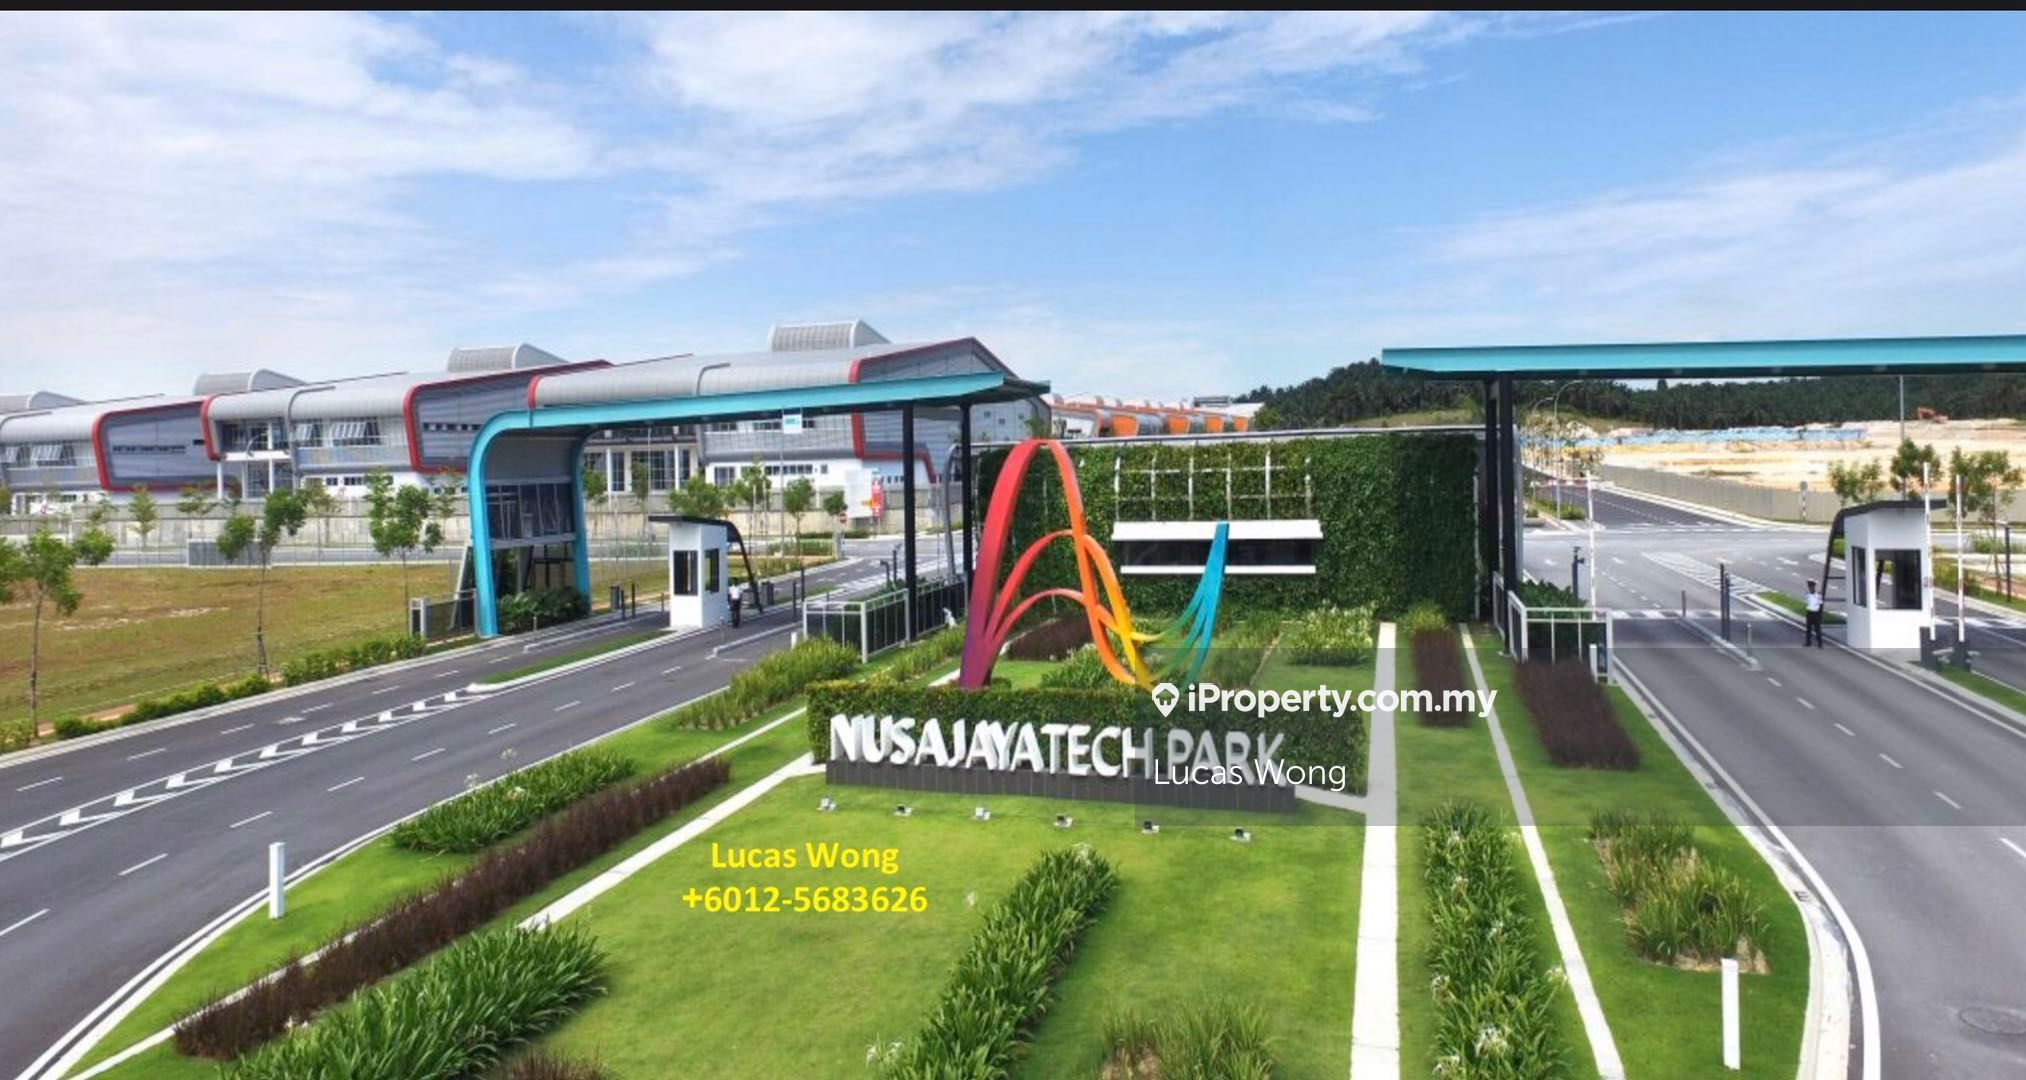 Nusajaya Tech Park , Iskandar Puteri (Nusajaya)